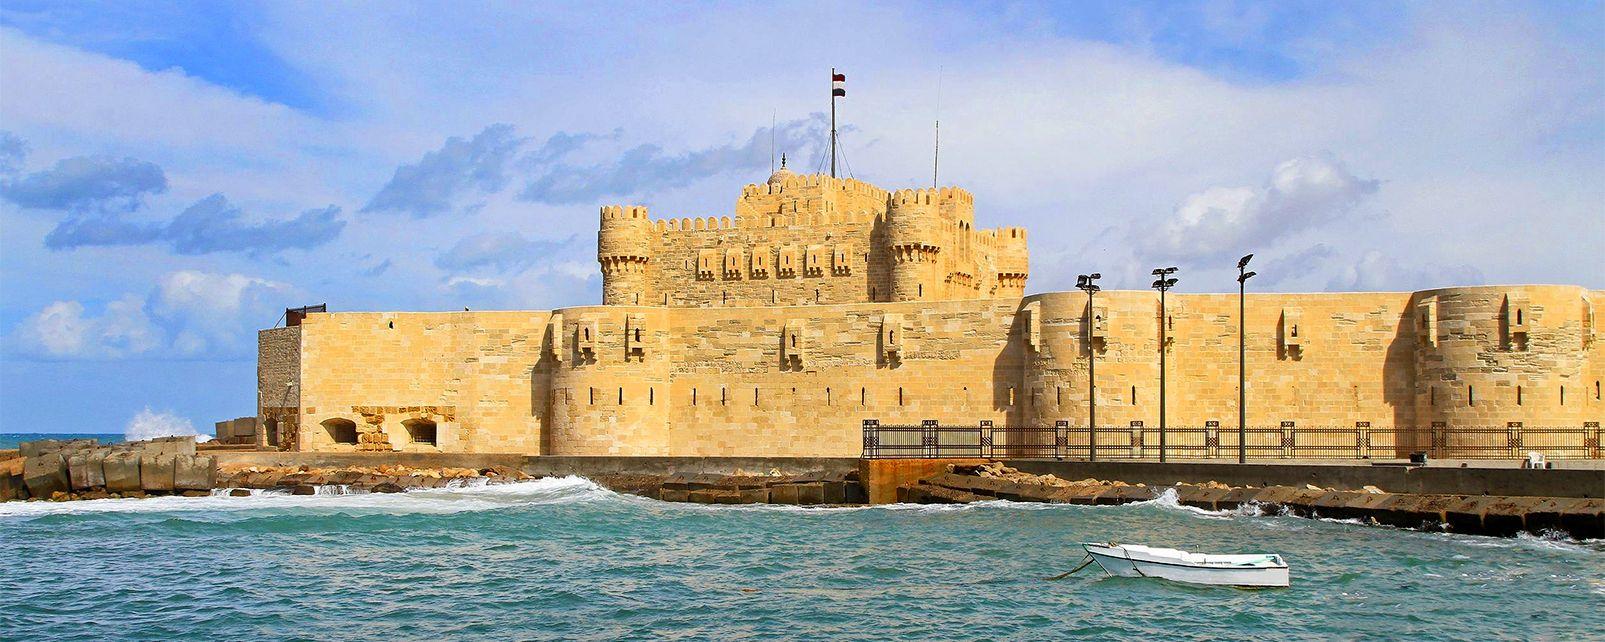 Le fort Qaitbay, Les sites, Alexandrie, Egypte